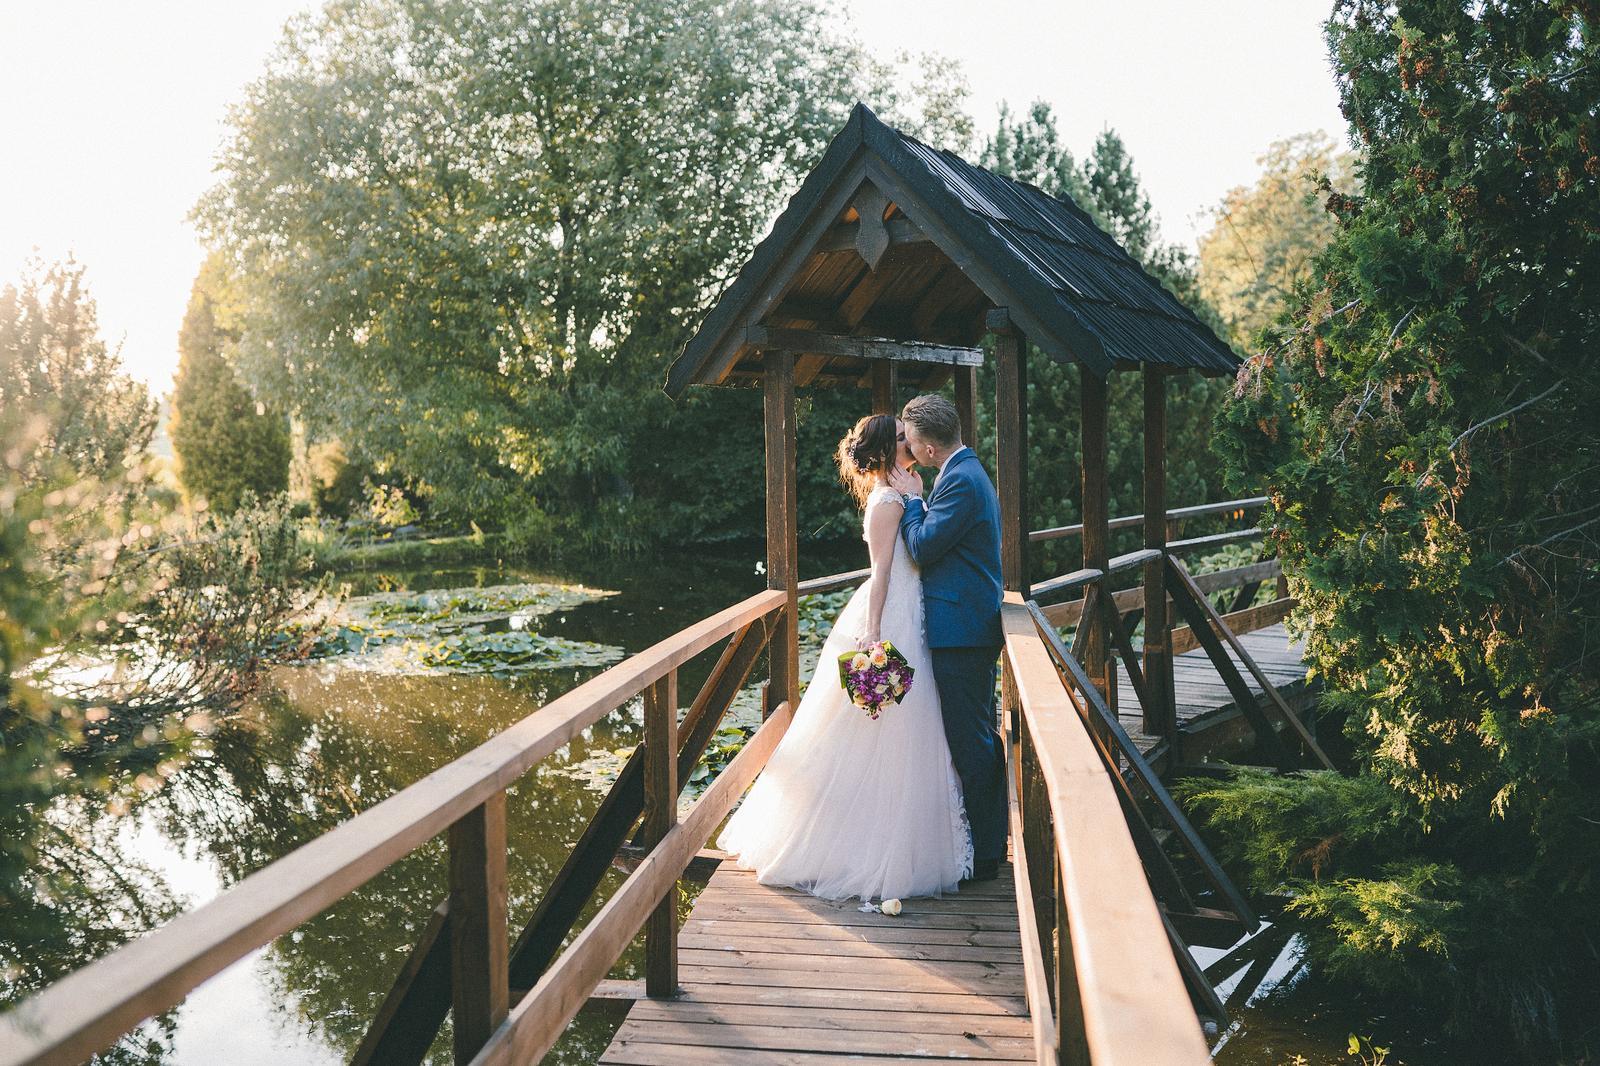 Svatba Ž&M - Obrázek č. 5